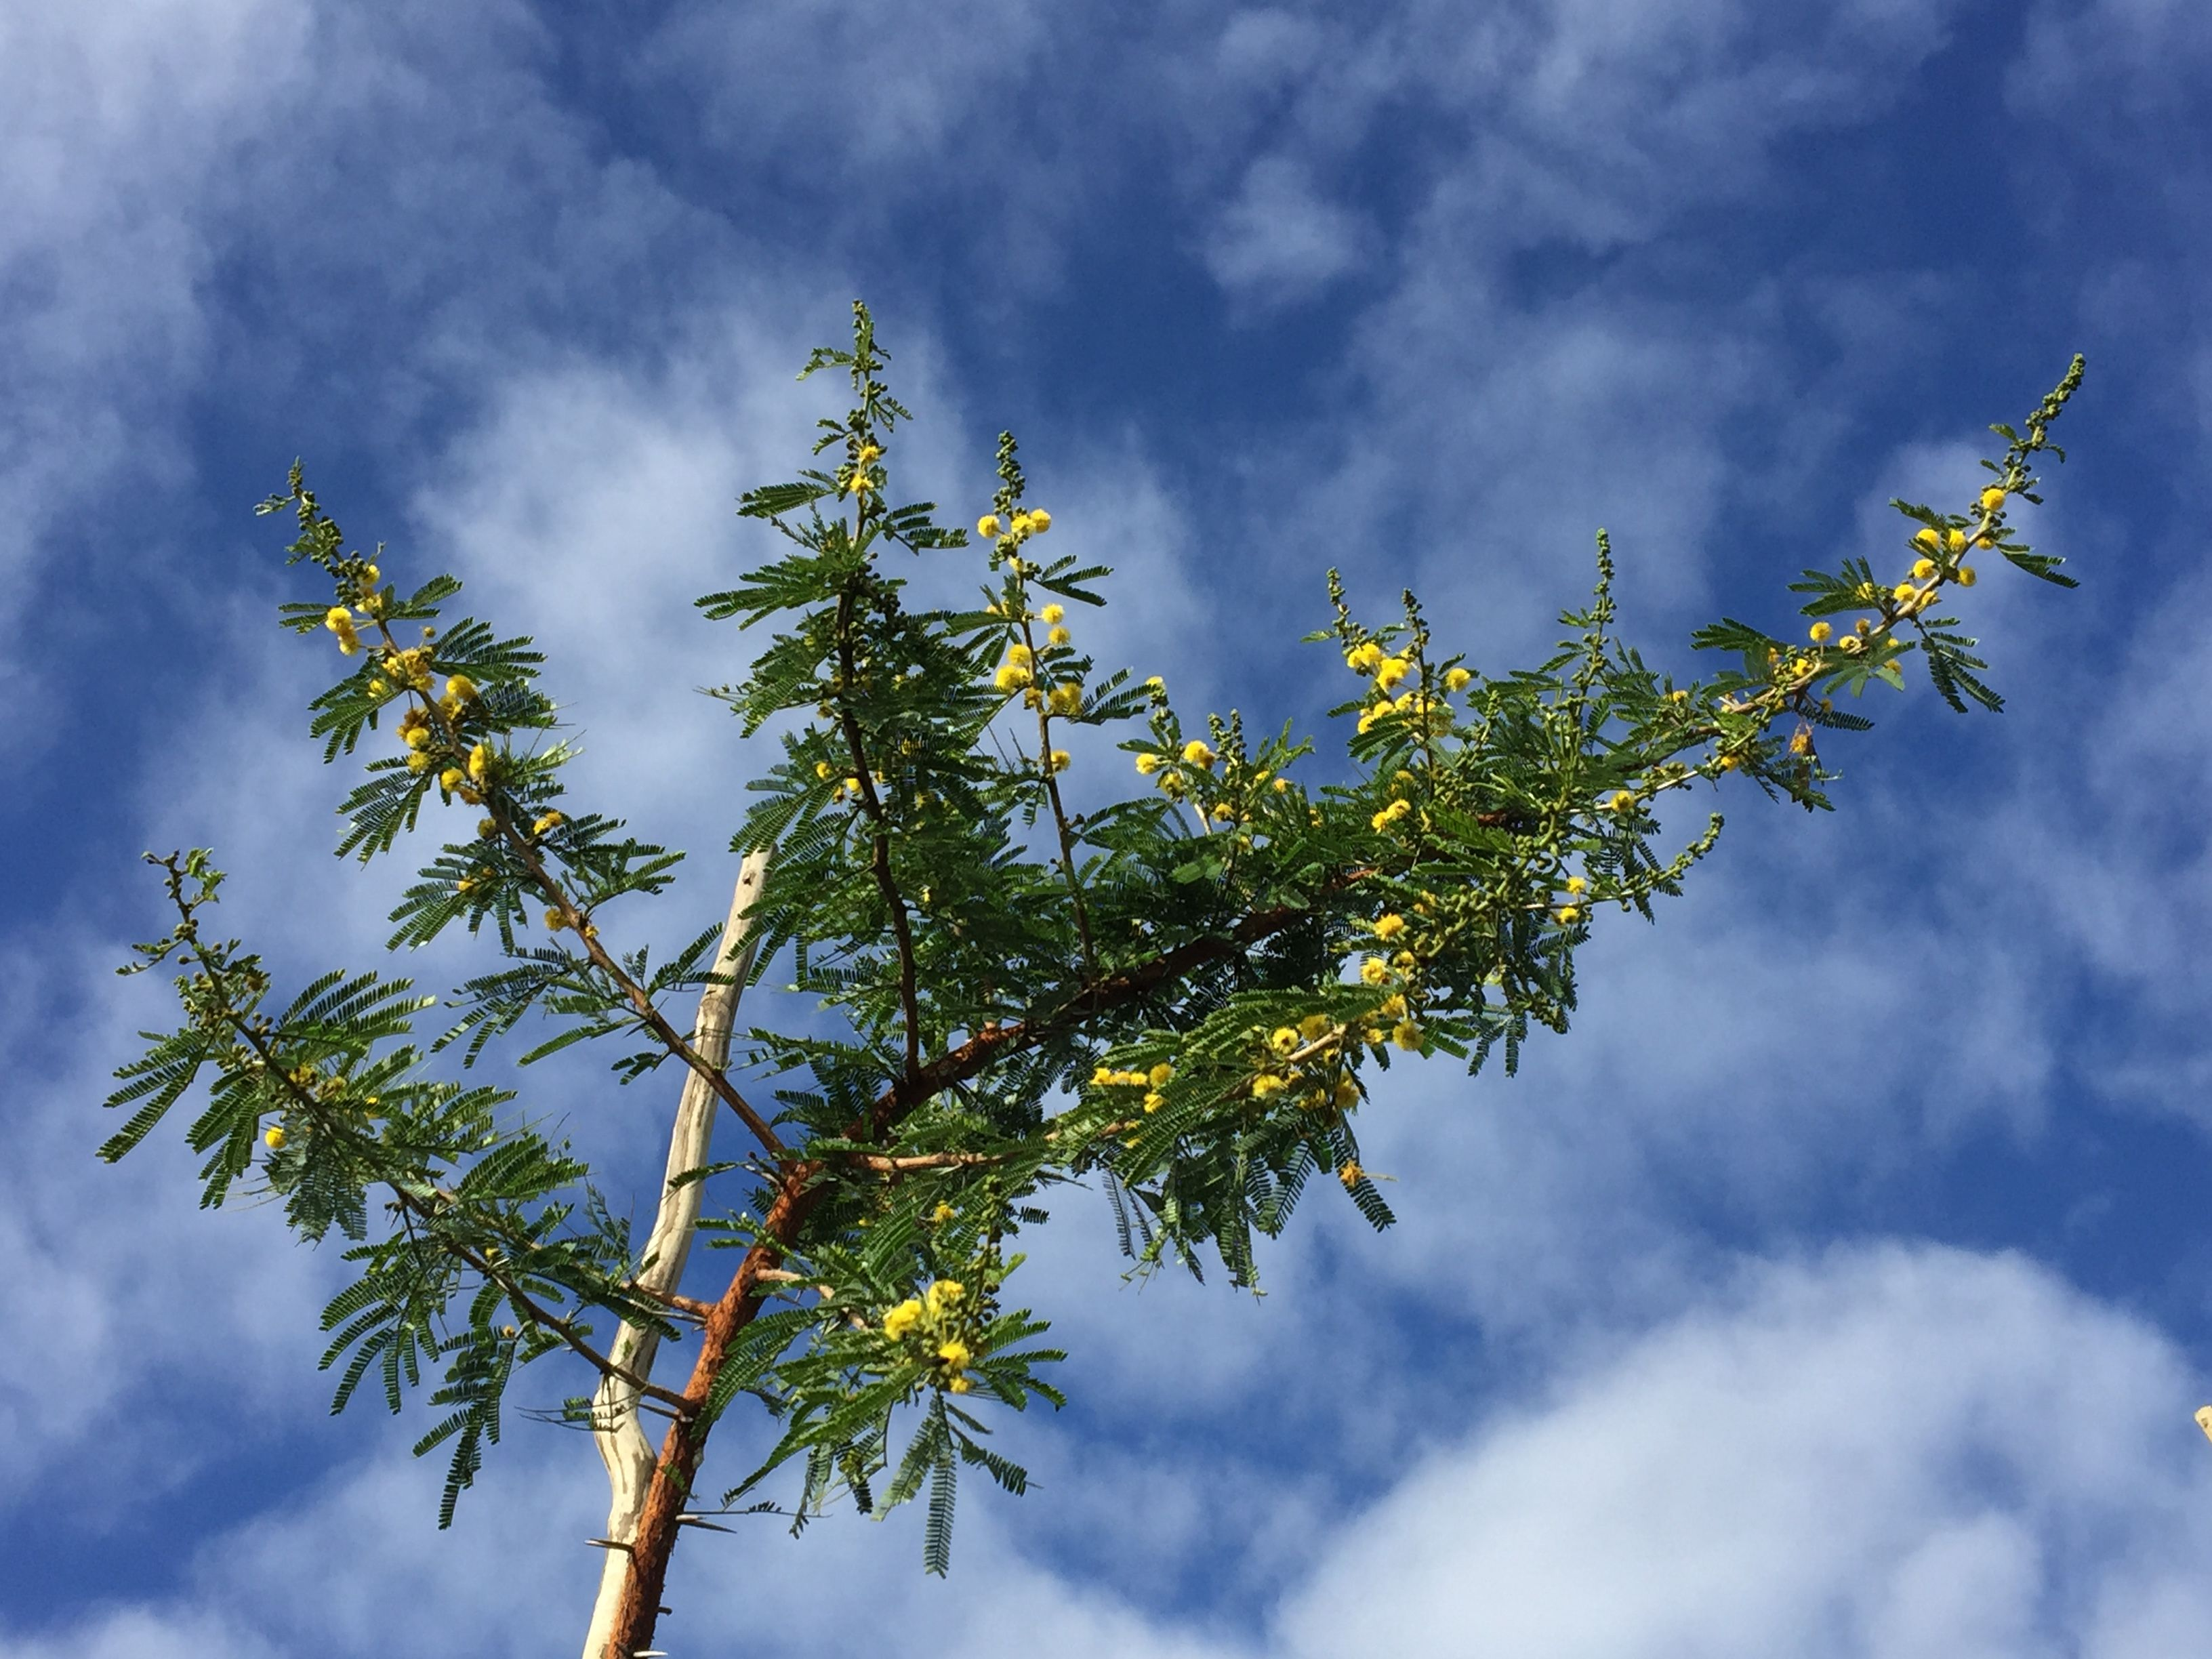 Acacia Karroo Presently Known As Vachellia Karroo Sweet Thorn Cape Karoo Mimosa Trees To Plant Plants Growers